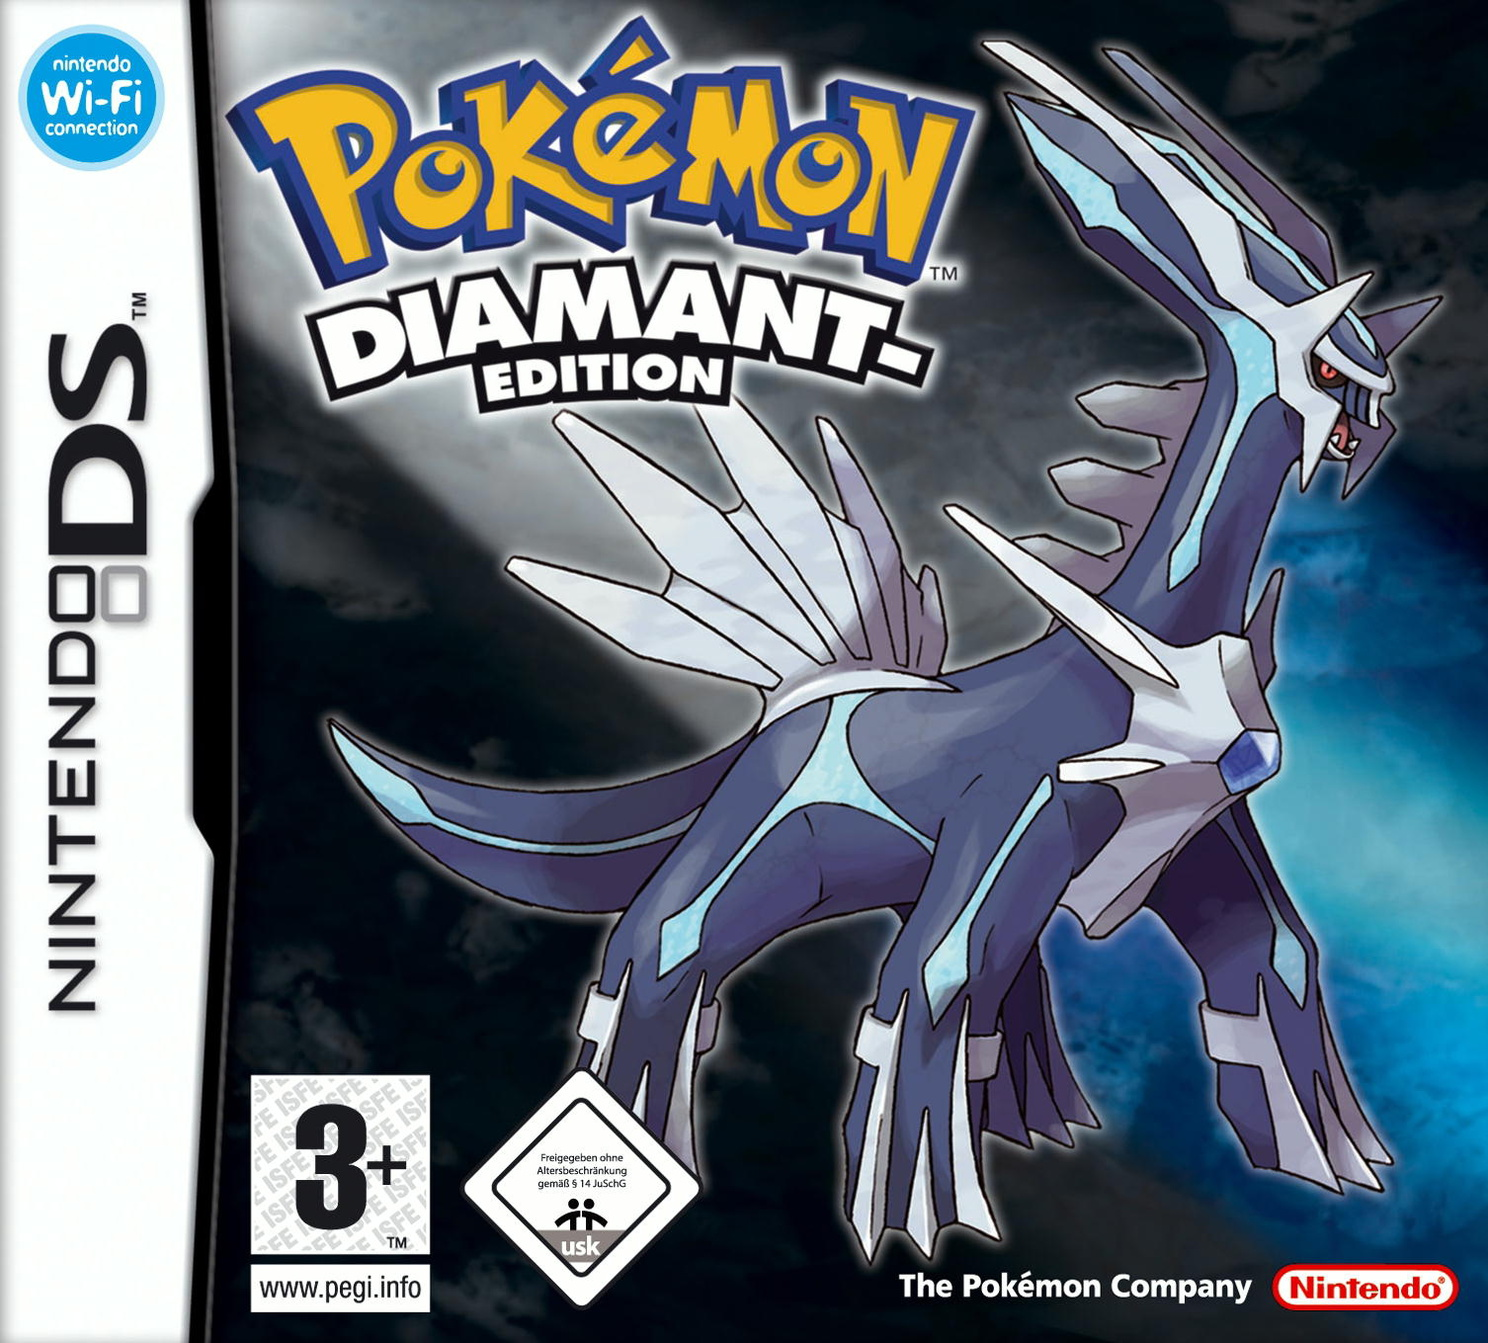 Pokémon Diamant Edition